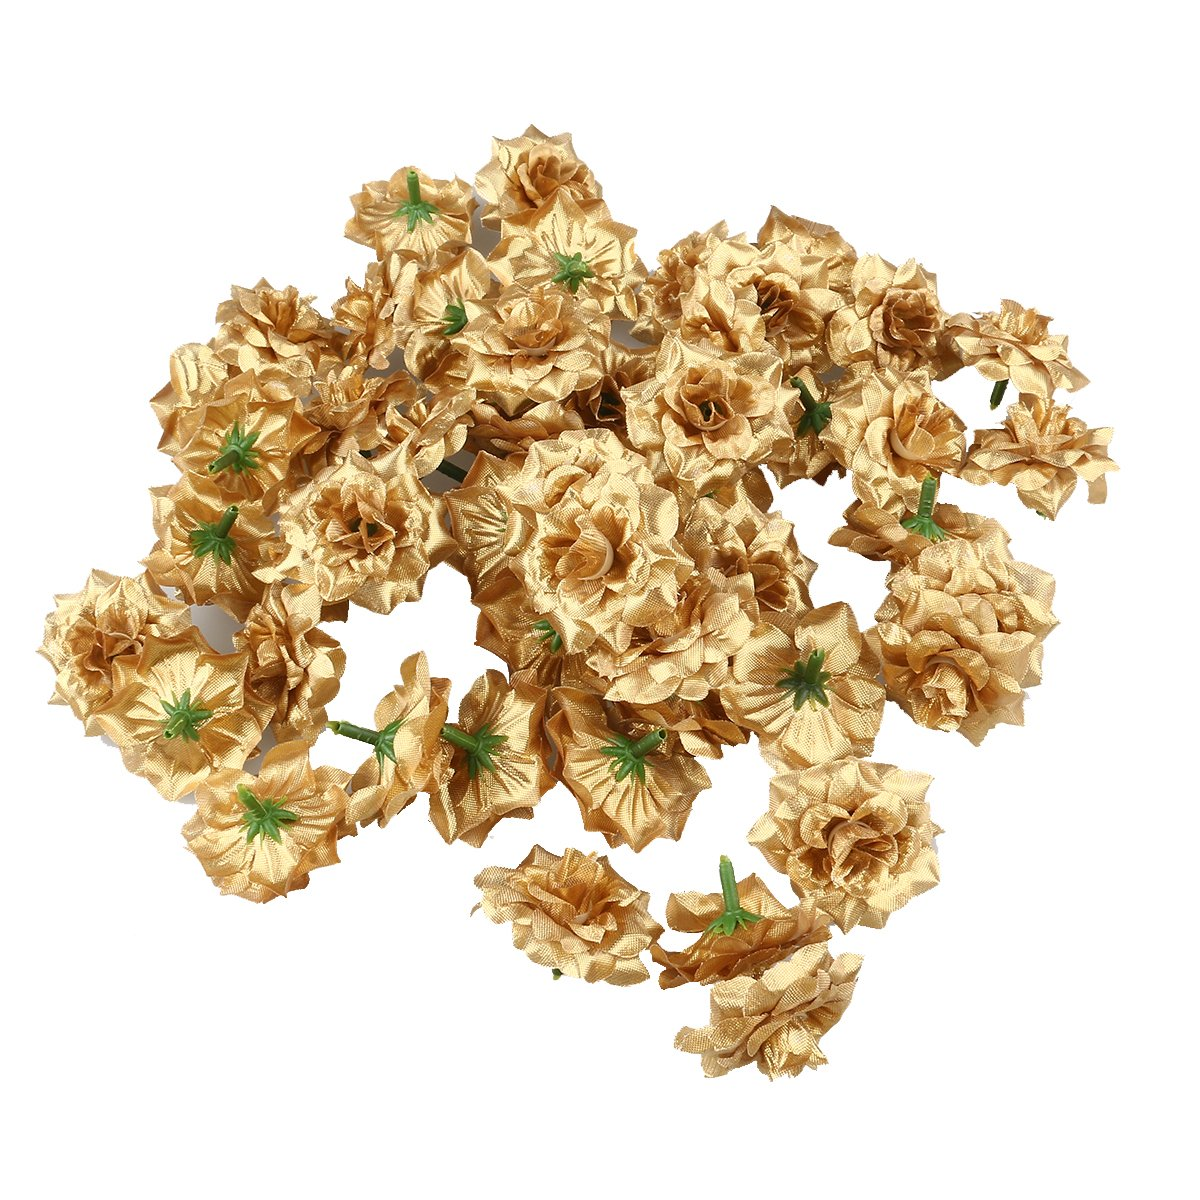 Tinksky-Silk-Rose-Flower-Heads-for-Hat-Clothes-Album-EmbellishmentPack-of-50-Golden